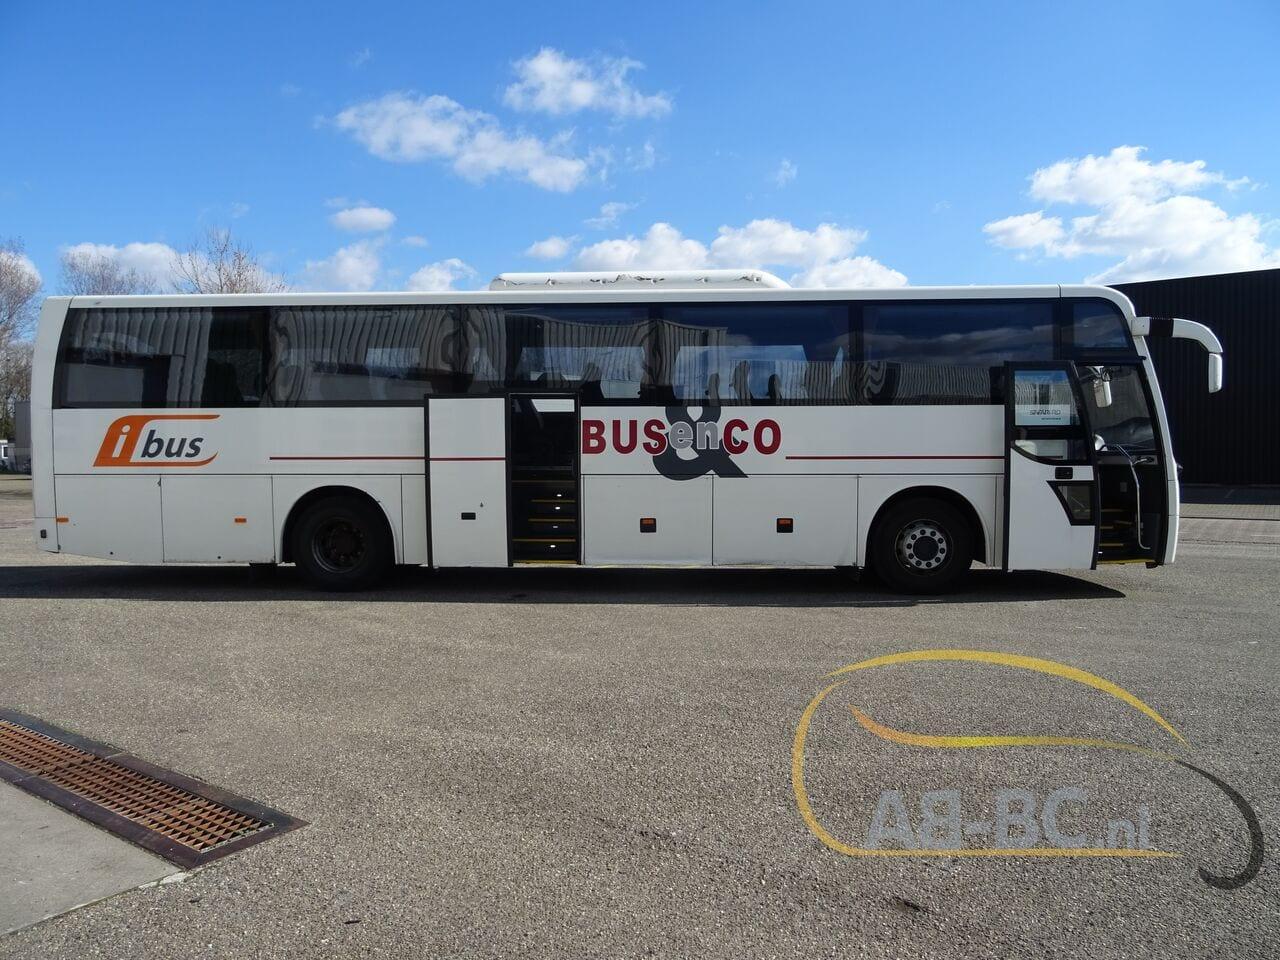 coach-busTEMSA-Safari-RD-53-Seats-DAF-Motor-12-mtr---1616166570440797368_big_eab5079ac10695b578ec008d41e336f8--21031917053743807500